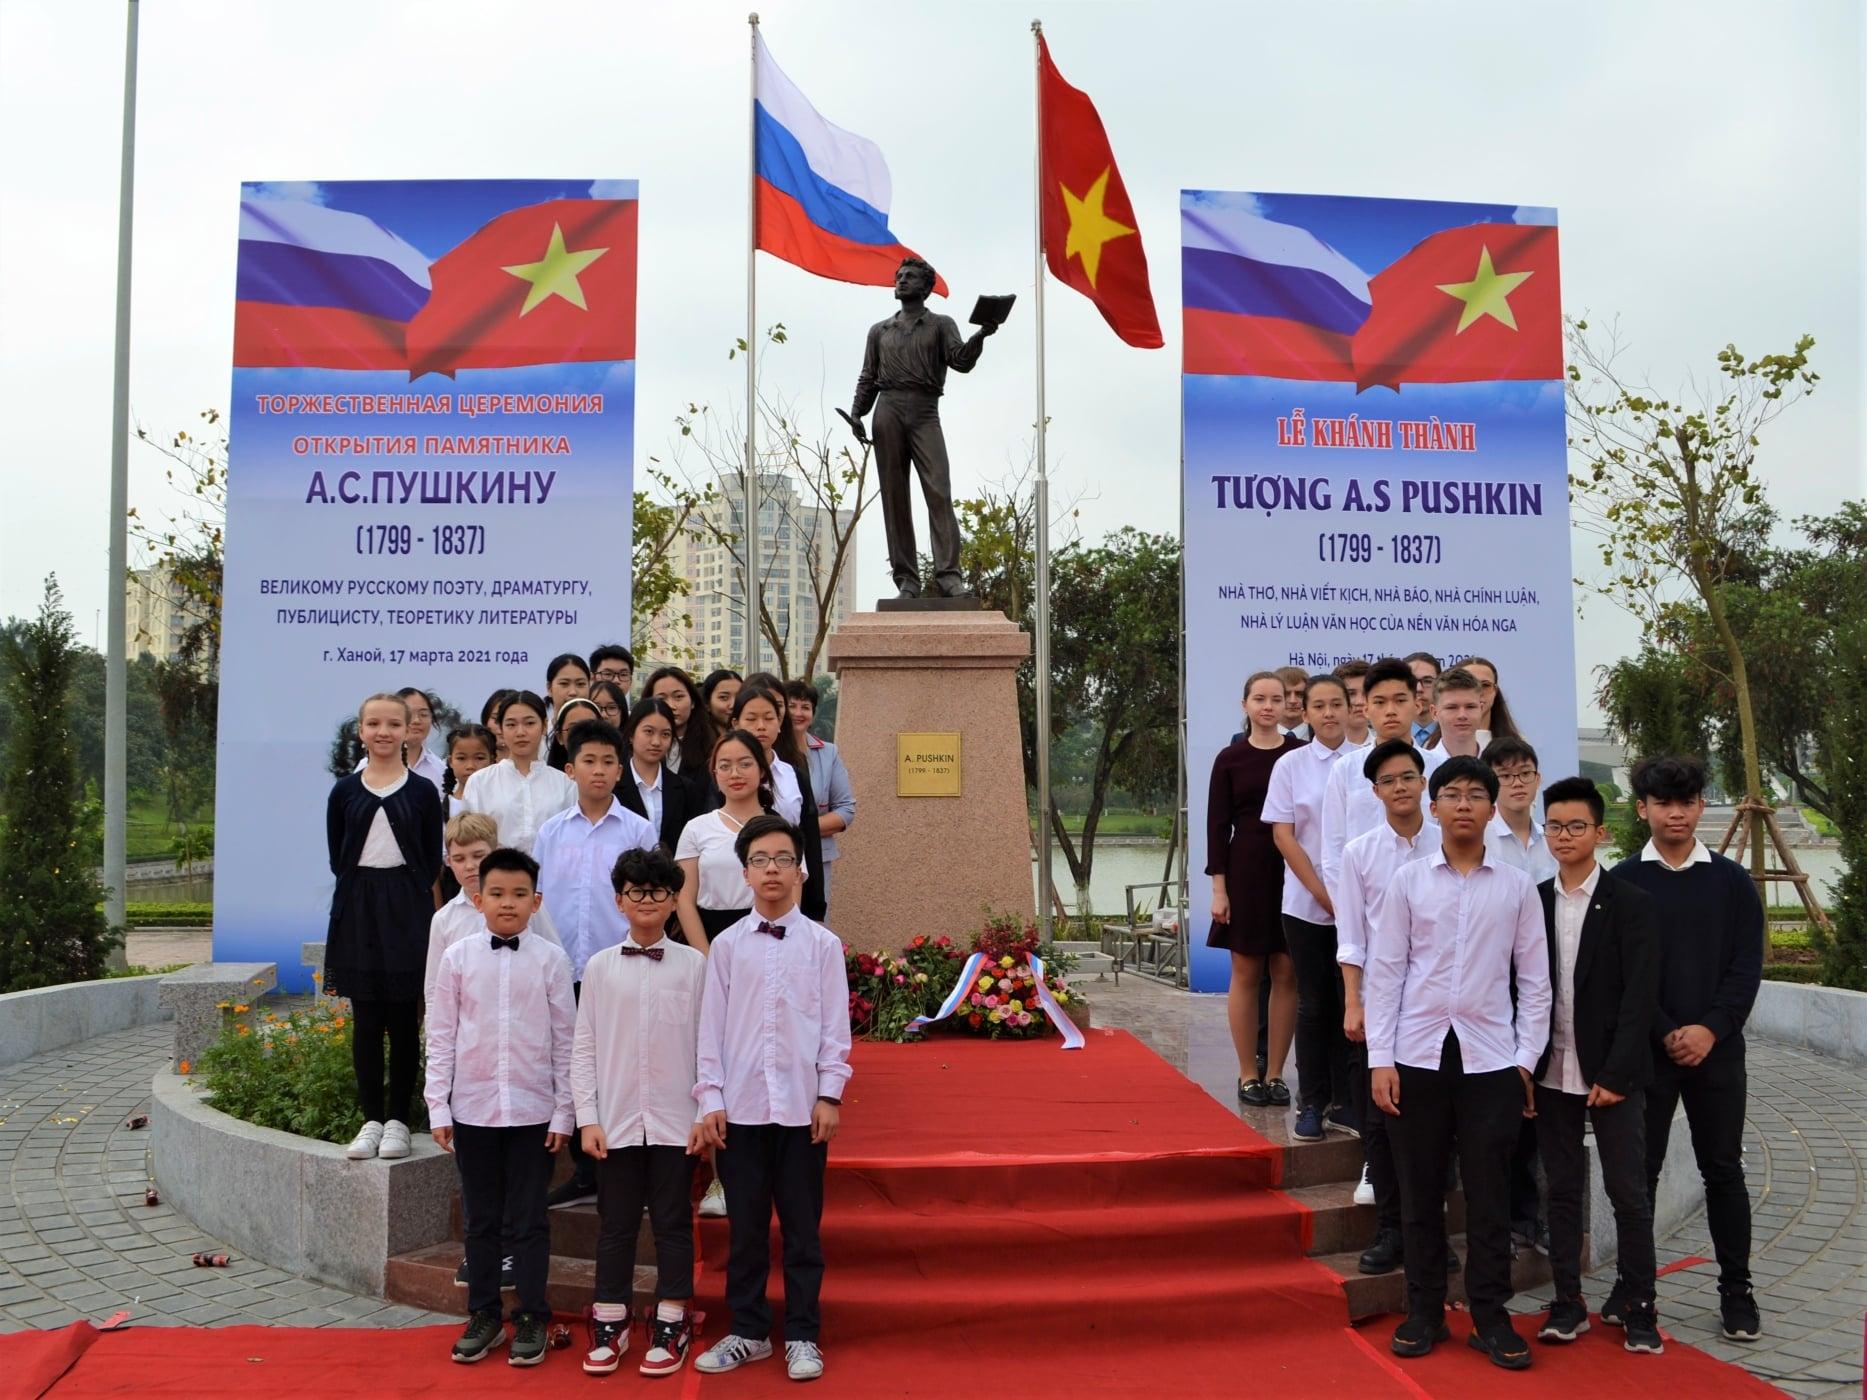 Famous Russian poet Pushkin unveiled in Hanoi's park